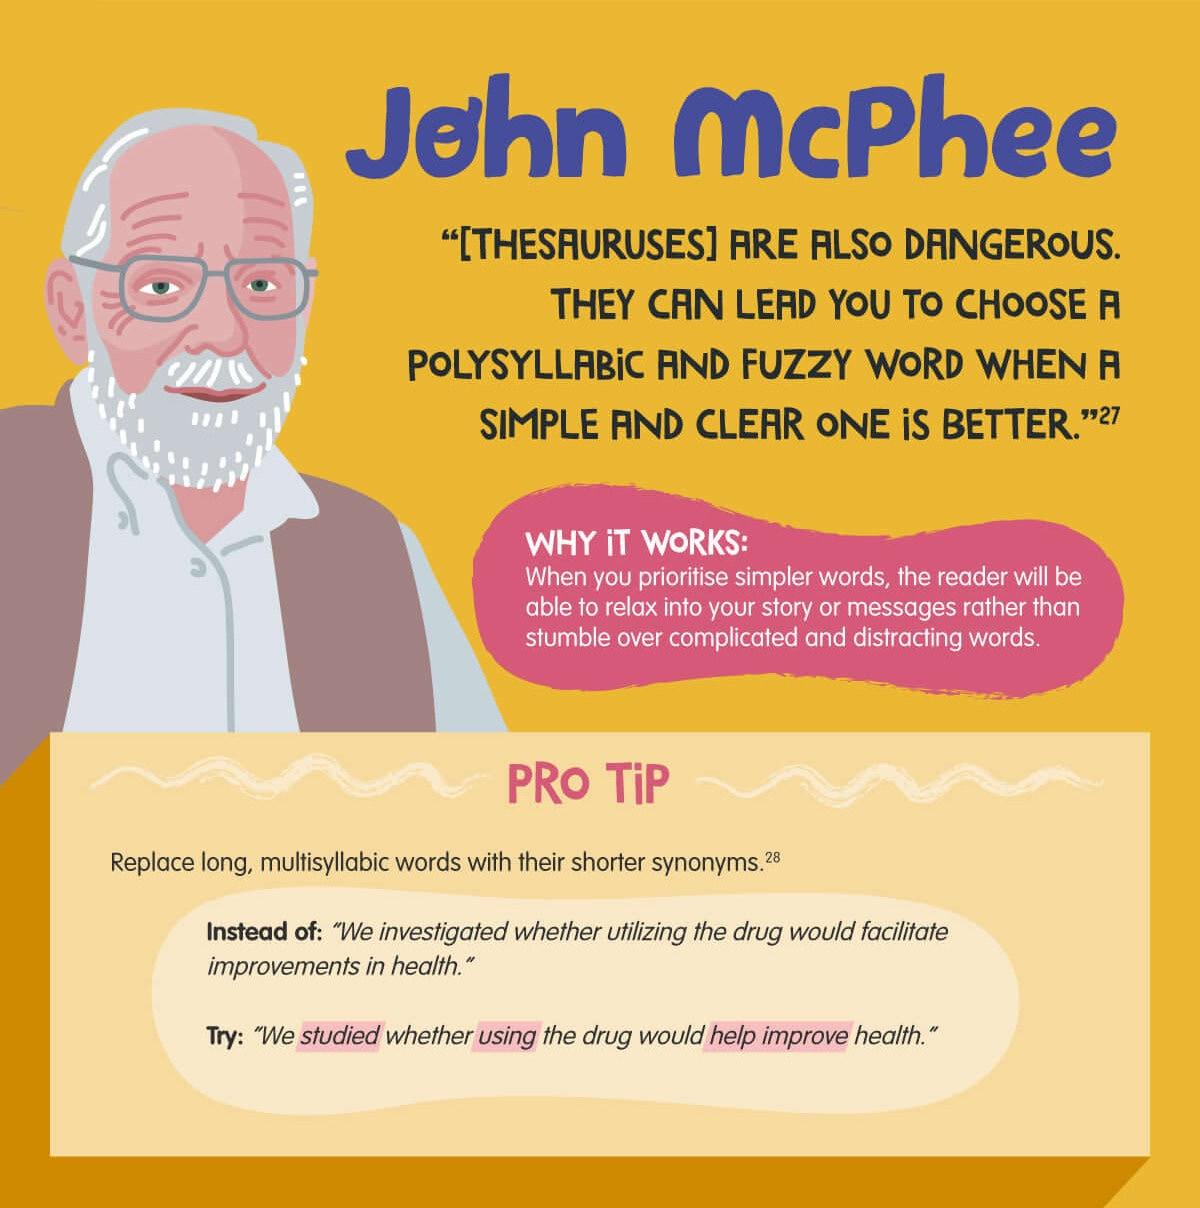 Writing tips from John McPhee